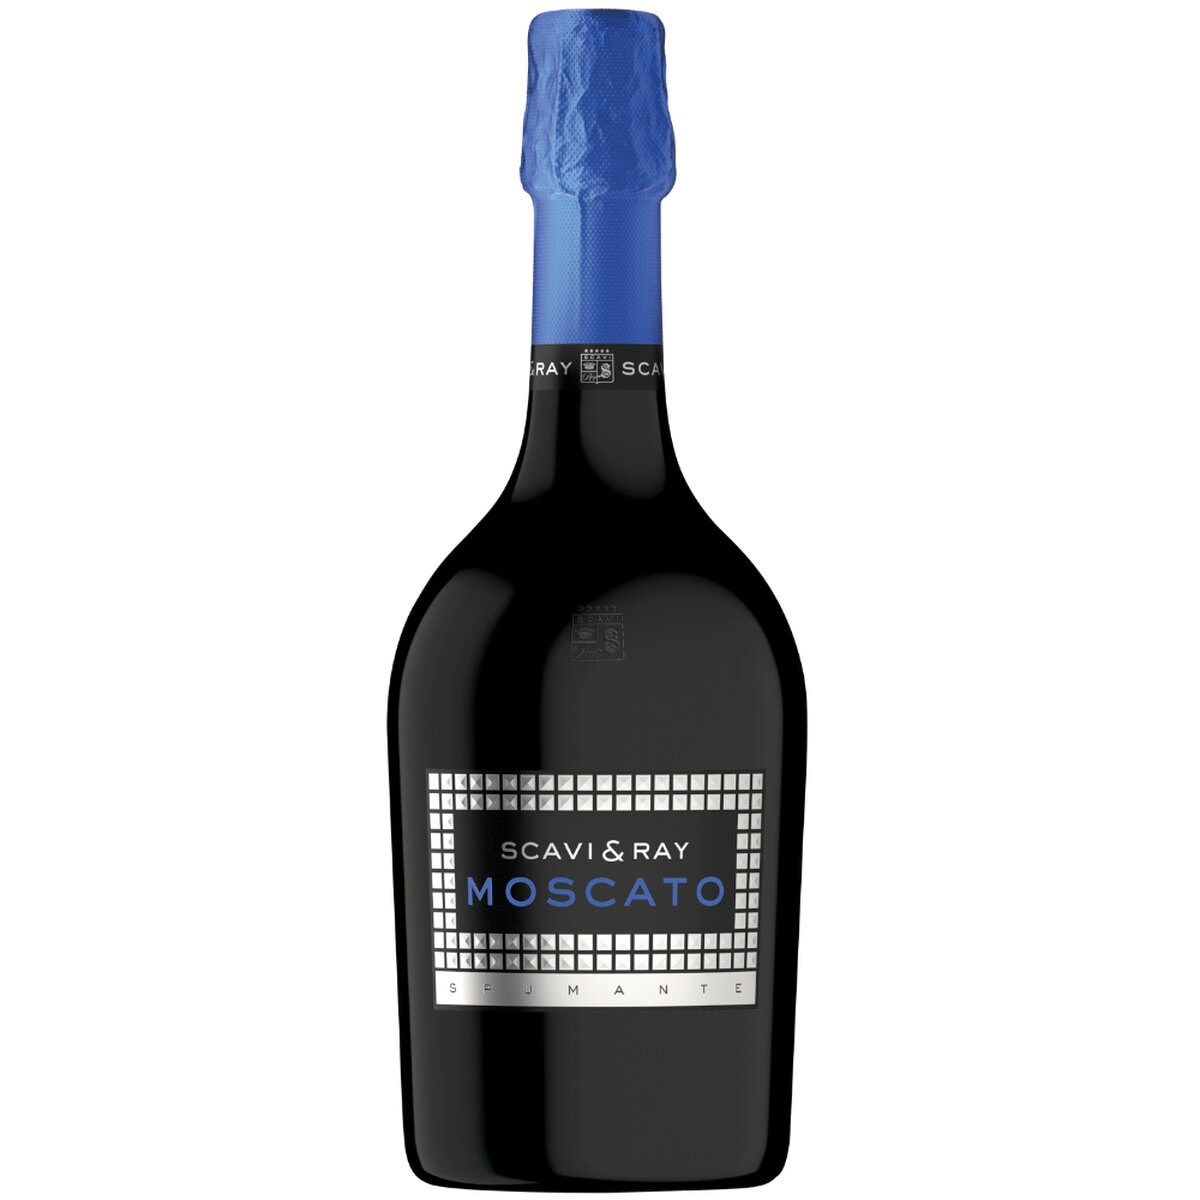 Scavi & Ray Moscato Spumante - Scavi & Ray Winery - , , , ,